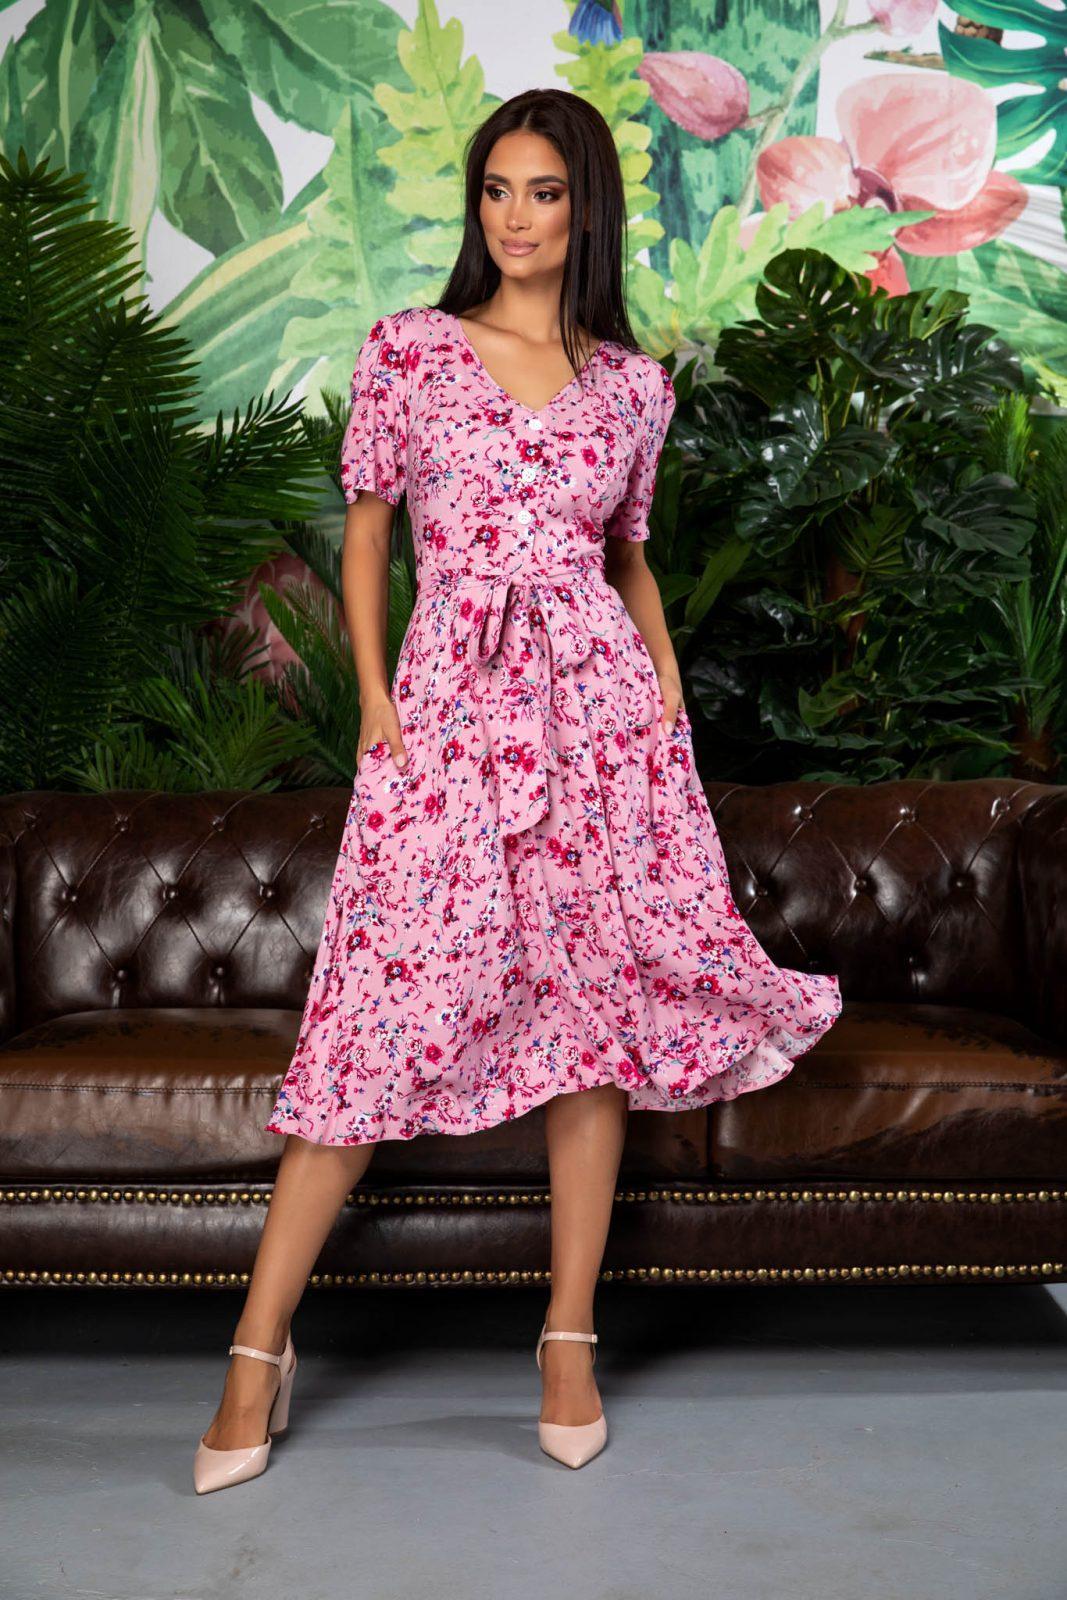 Corinne Pink Dress